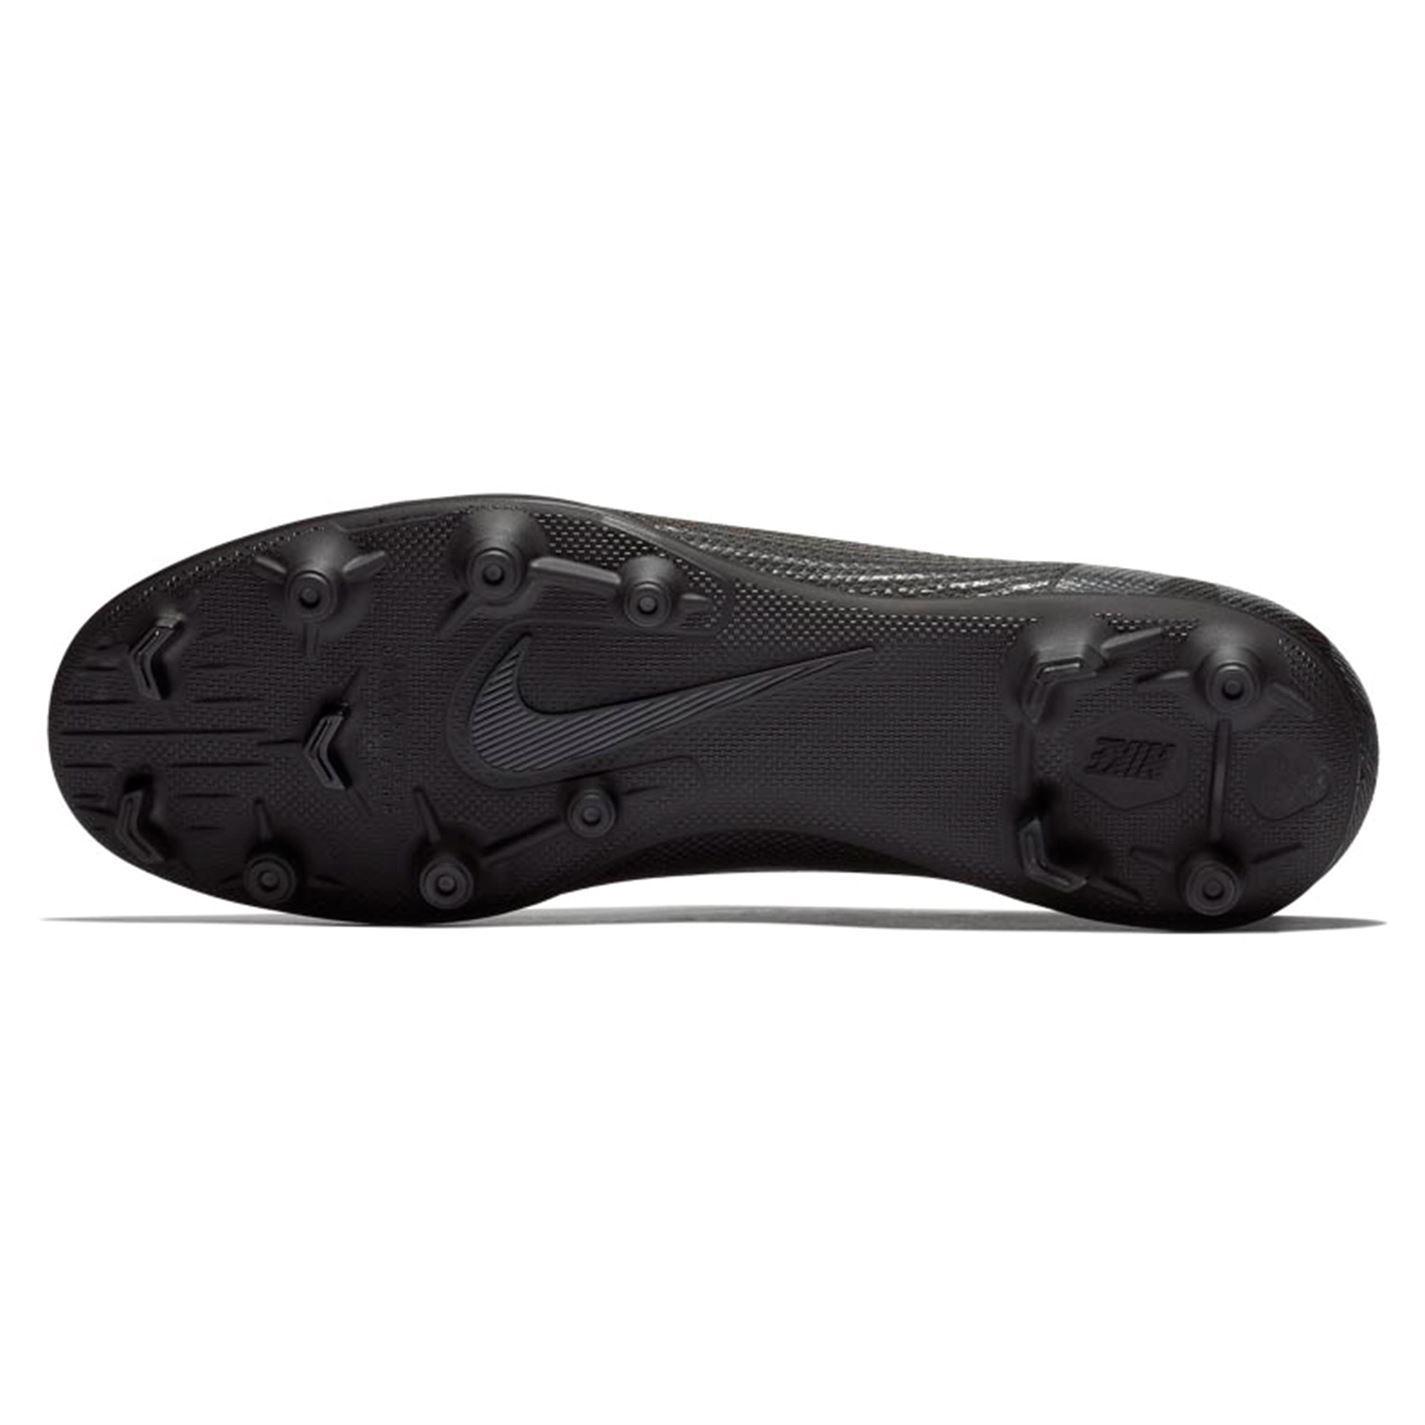 sports shoes cbf46 2c086 ... Nike Mercurial Vapor Club FG Firm Ground Football Boots Mens Black  Soccer Cleats ...